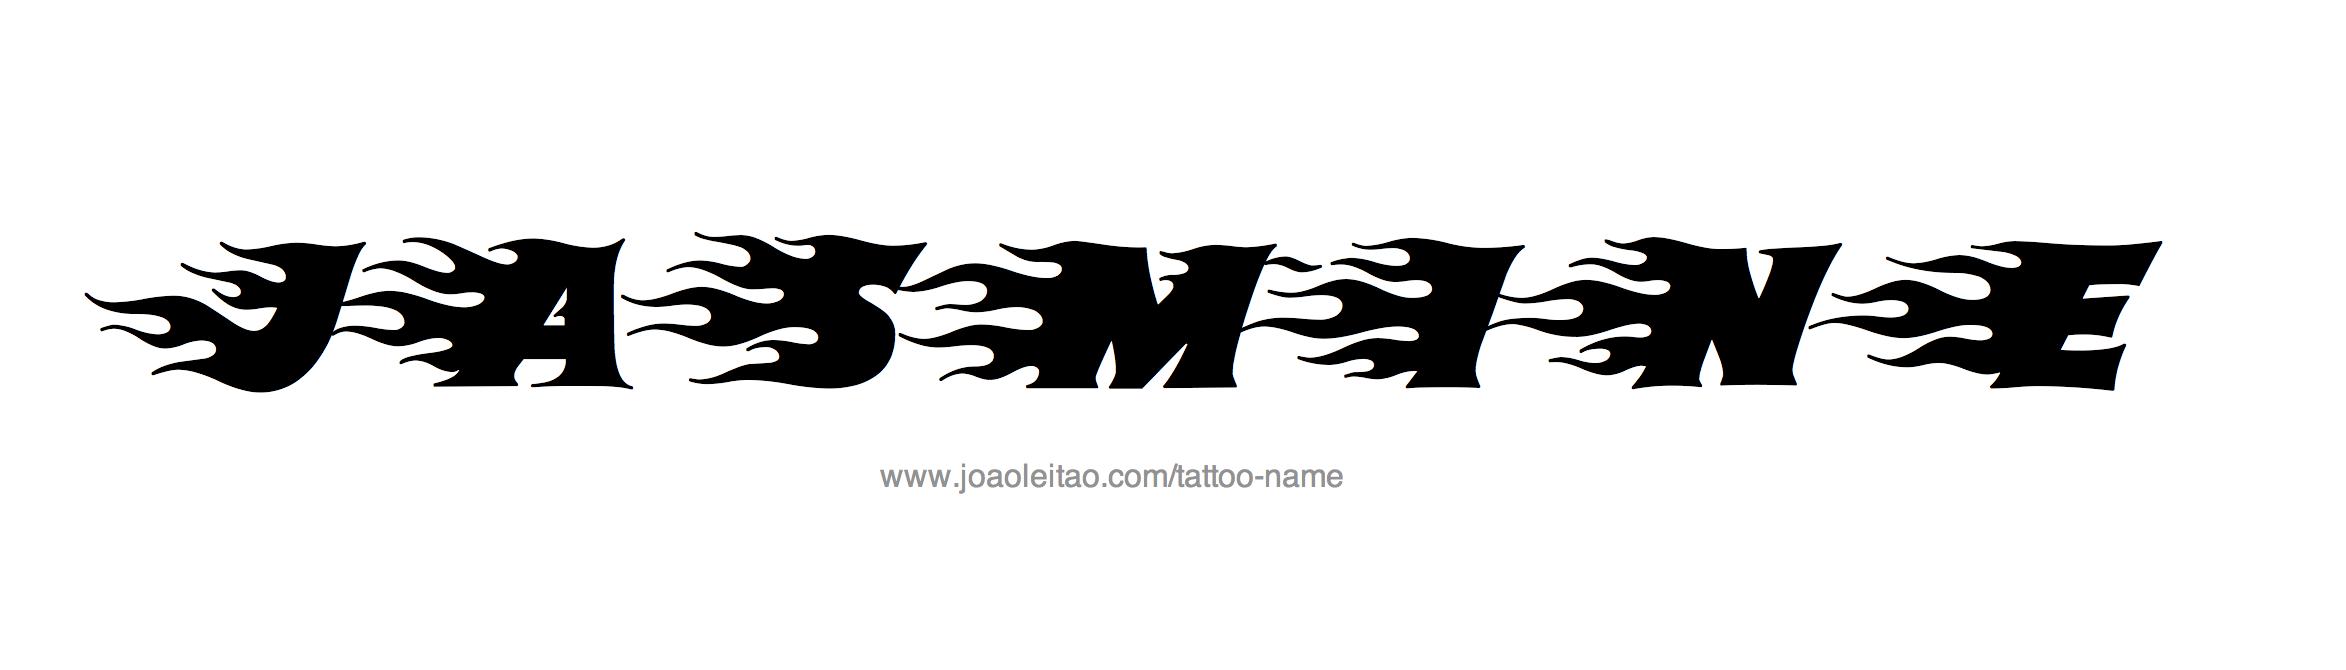 jasmine name design pictures to pin on pinterest thepinsta. Black Bedroom Furniture Sets. Home Design Ideas